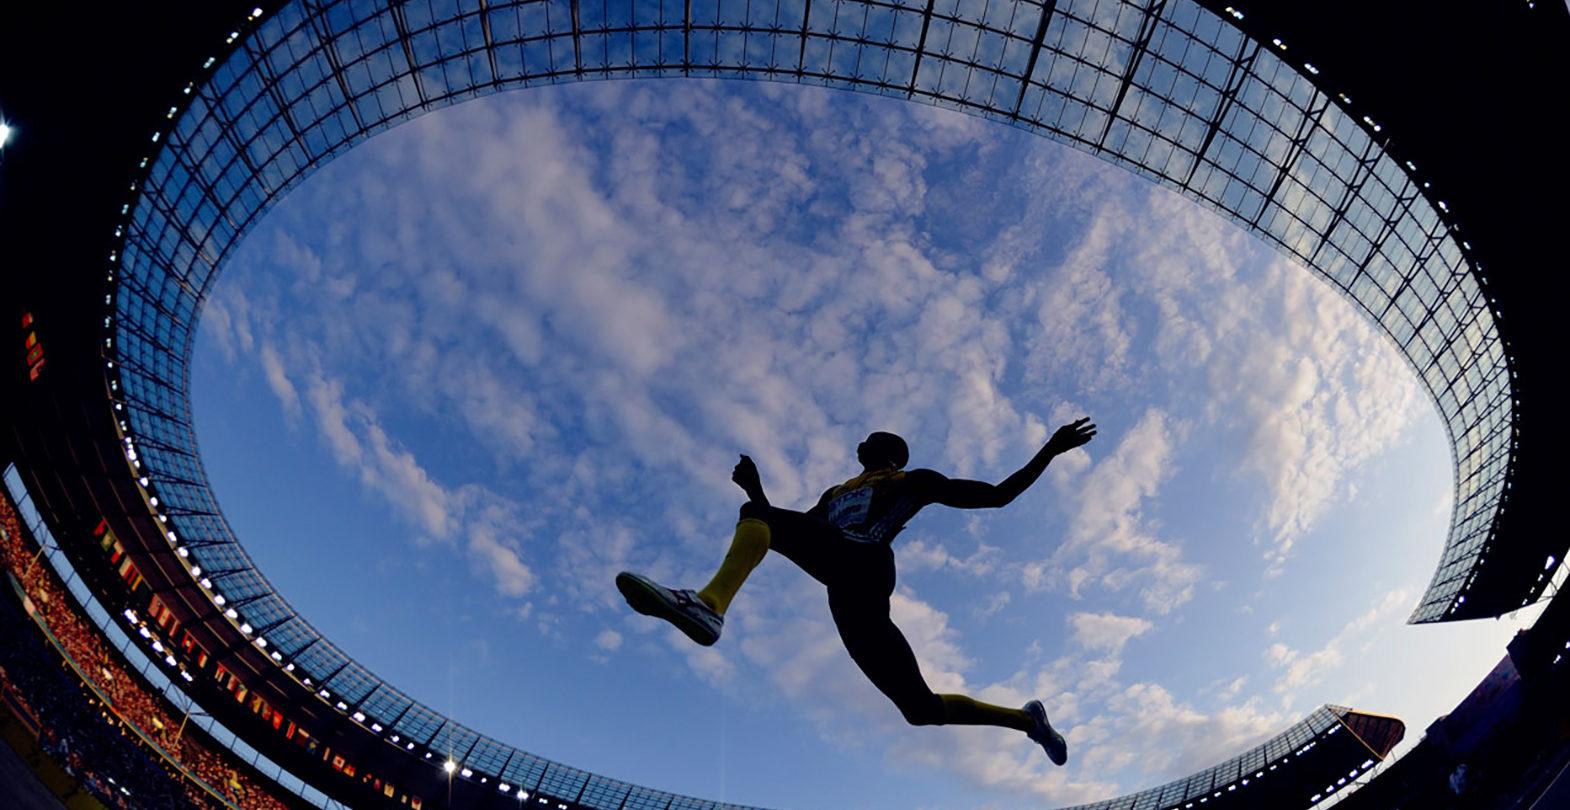 Sportveranstaltung Finals Berlin 2019 - Froschperspektive des Olympiastadions Berlin